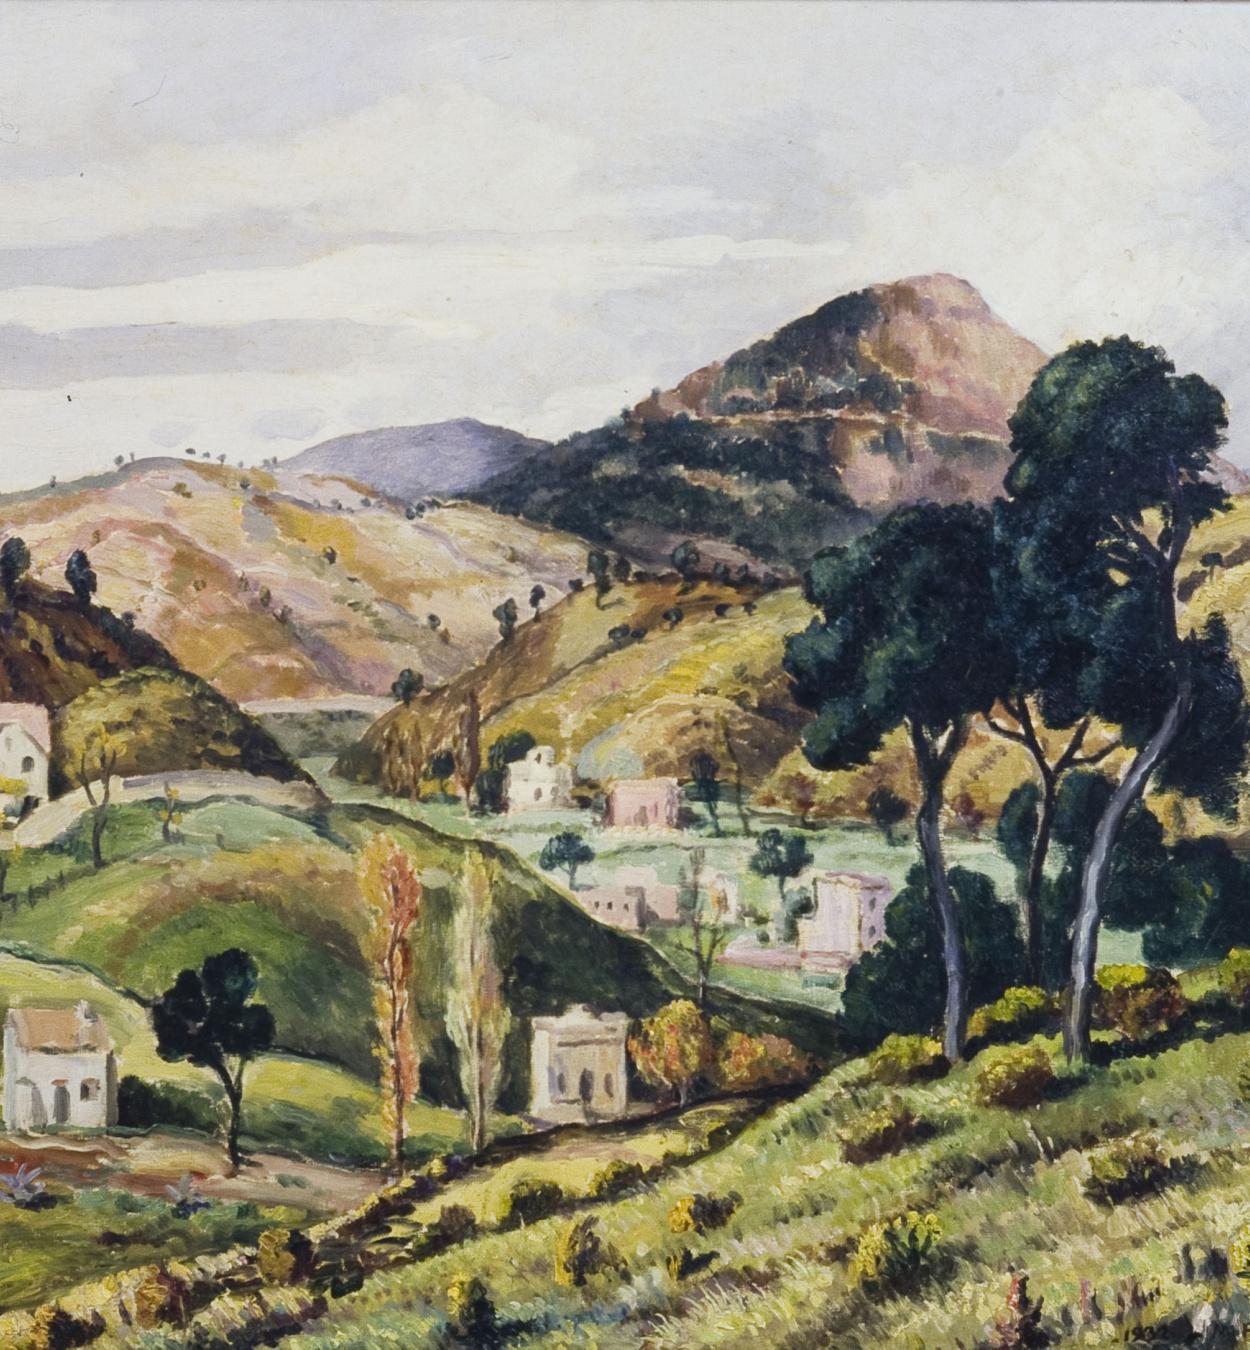 Marià Pidelaserra - Cloudy Day - 1932